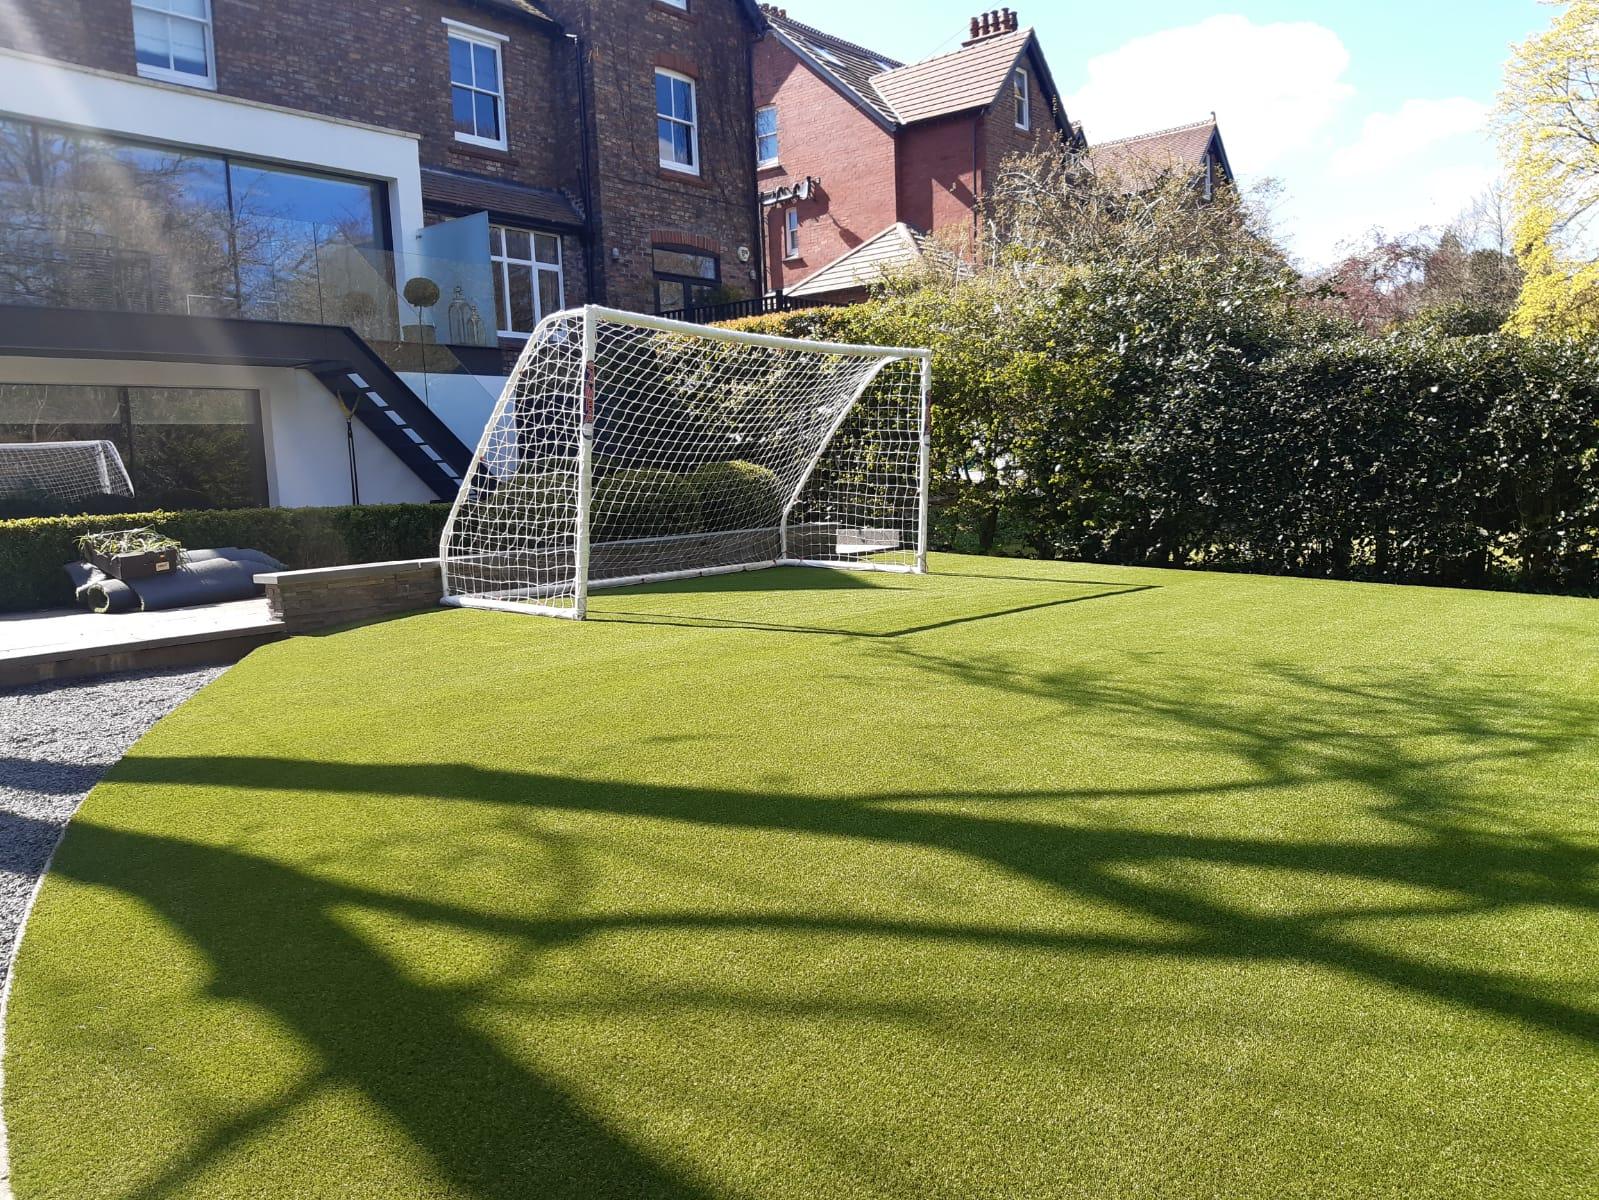 Football garden with artificial grass.